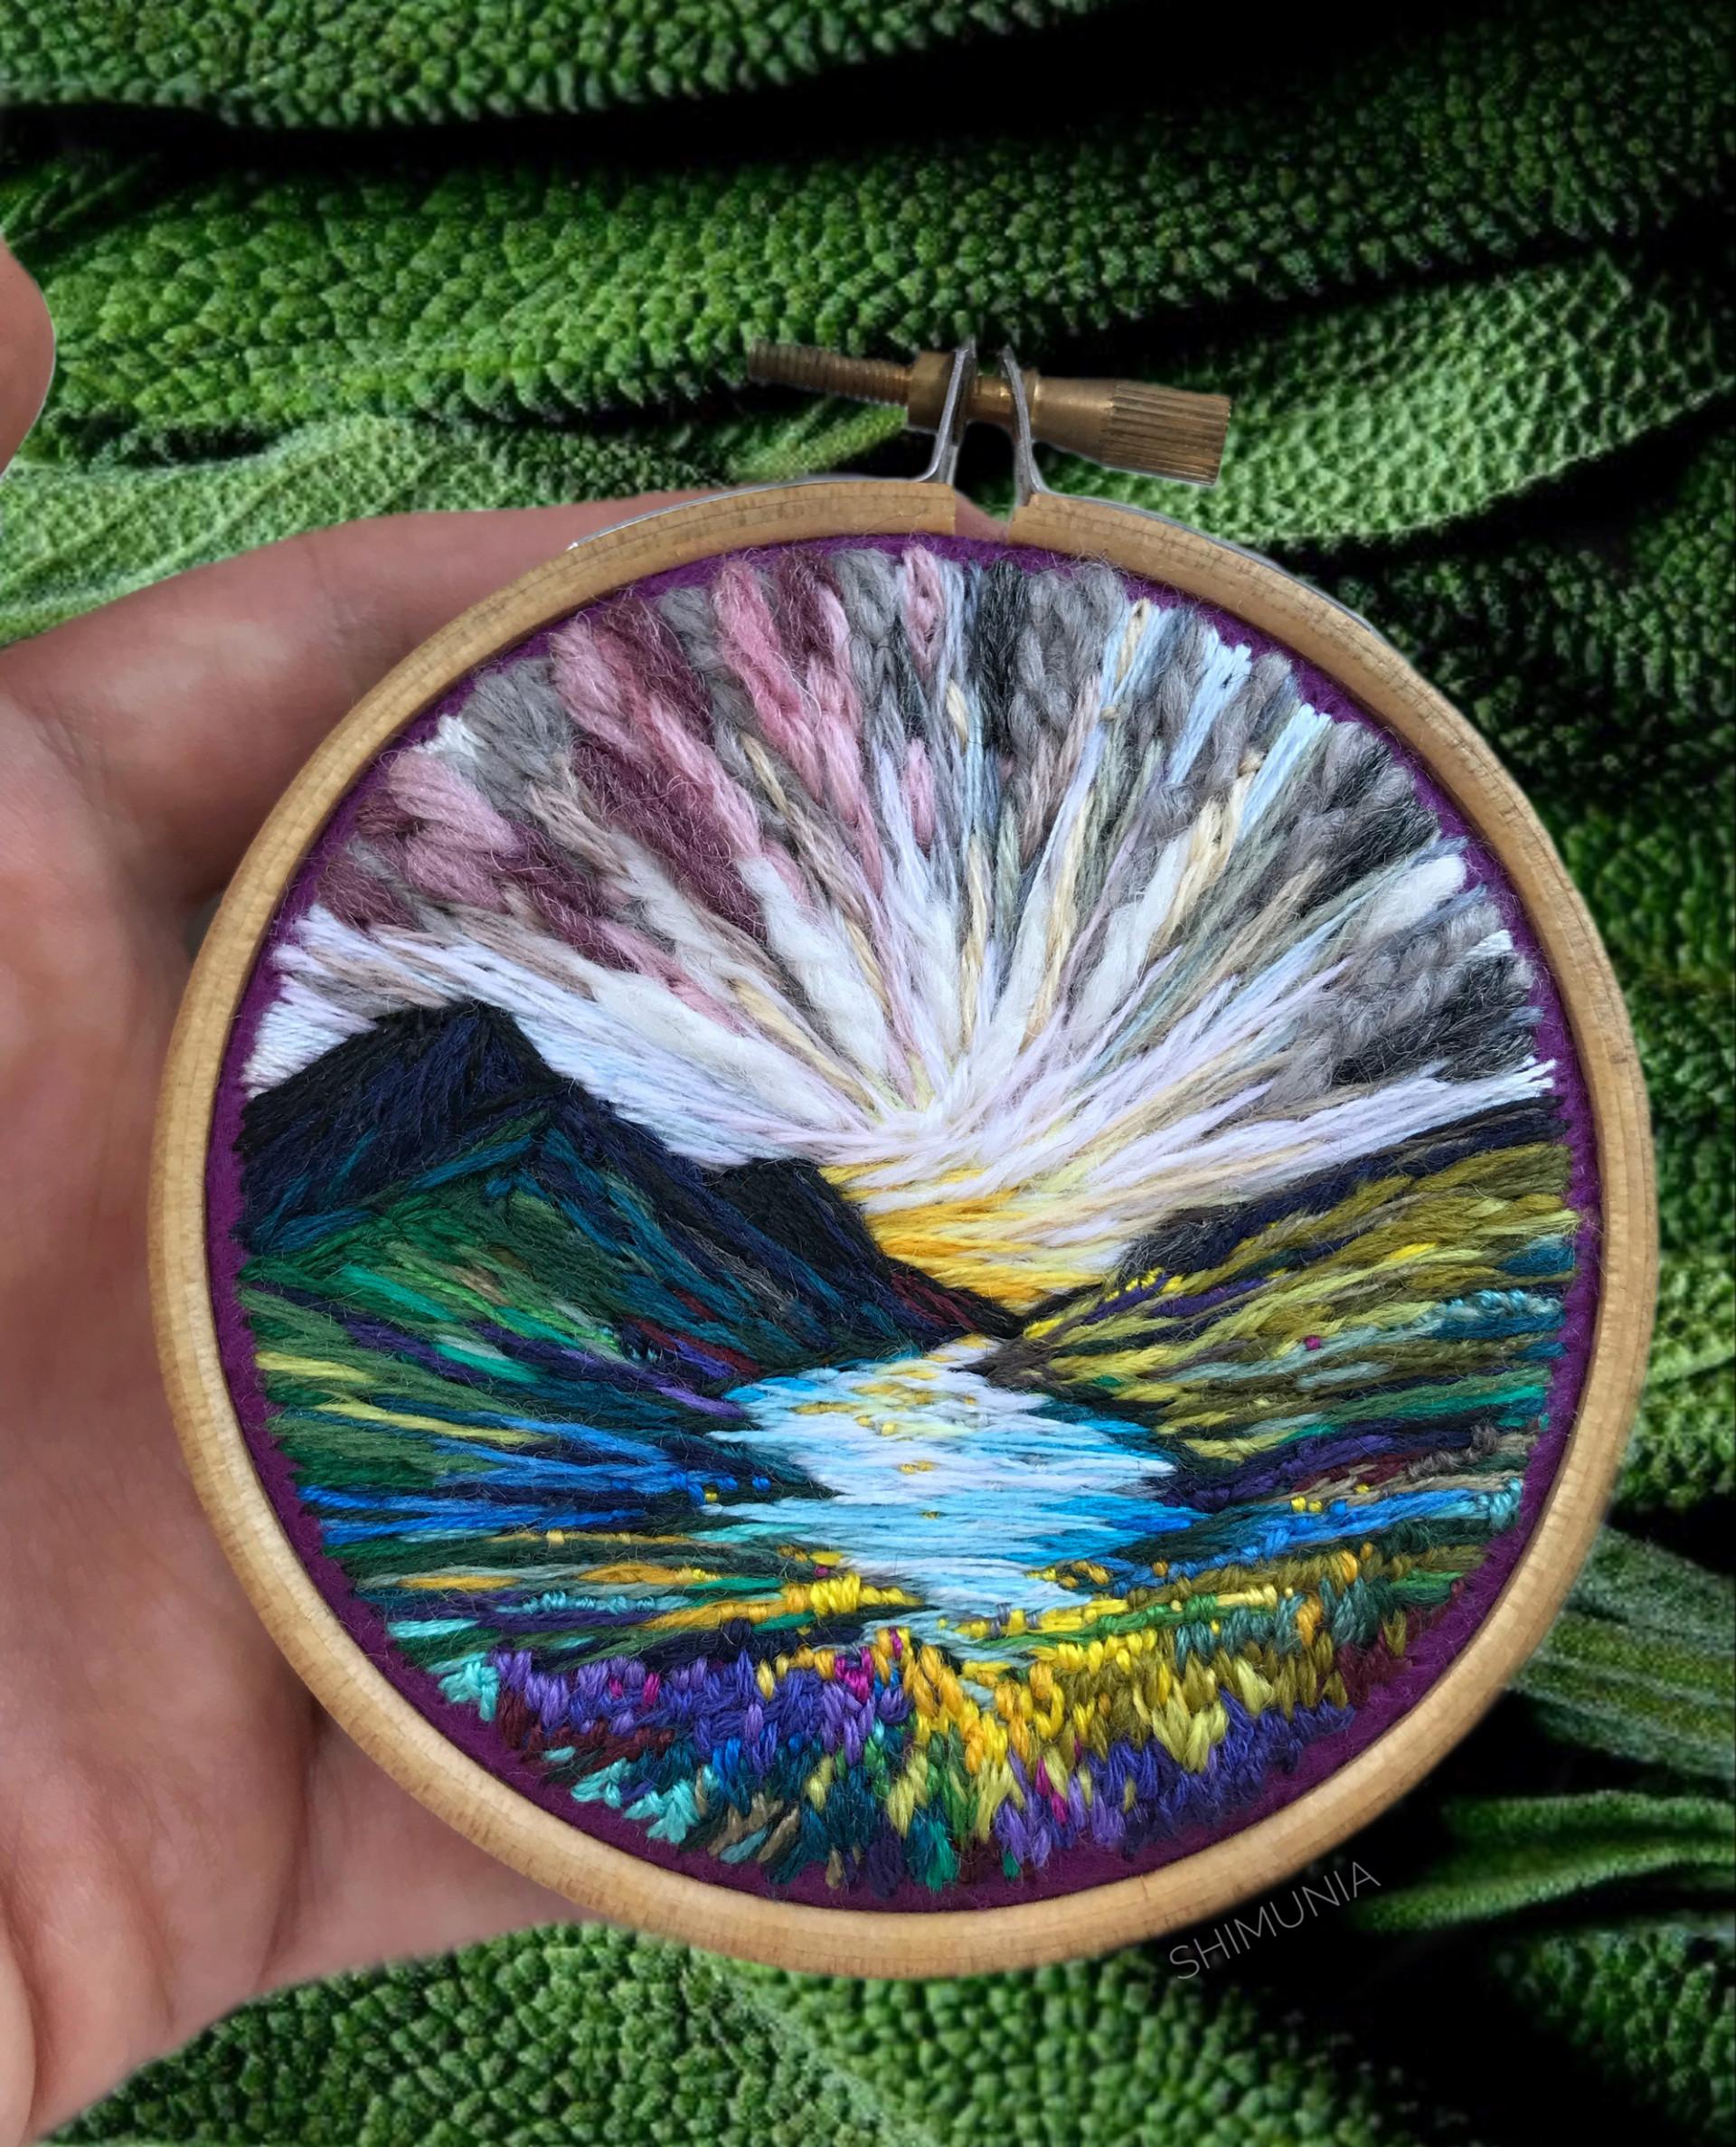 embroidery-5-960x1187@2x.jpg